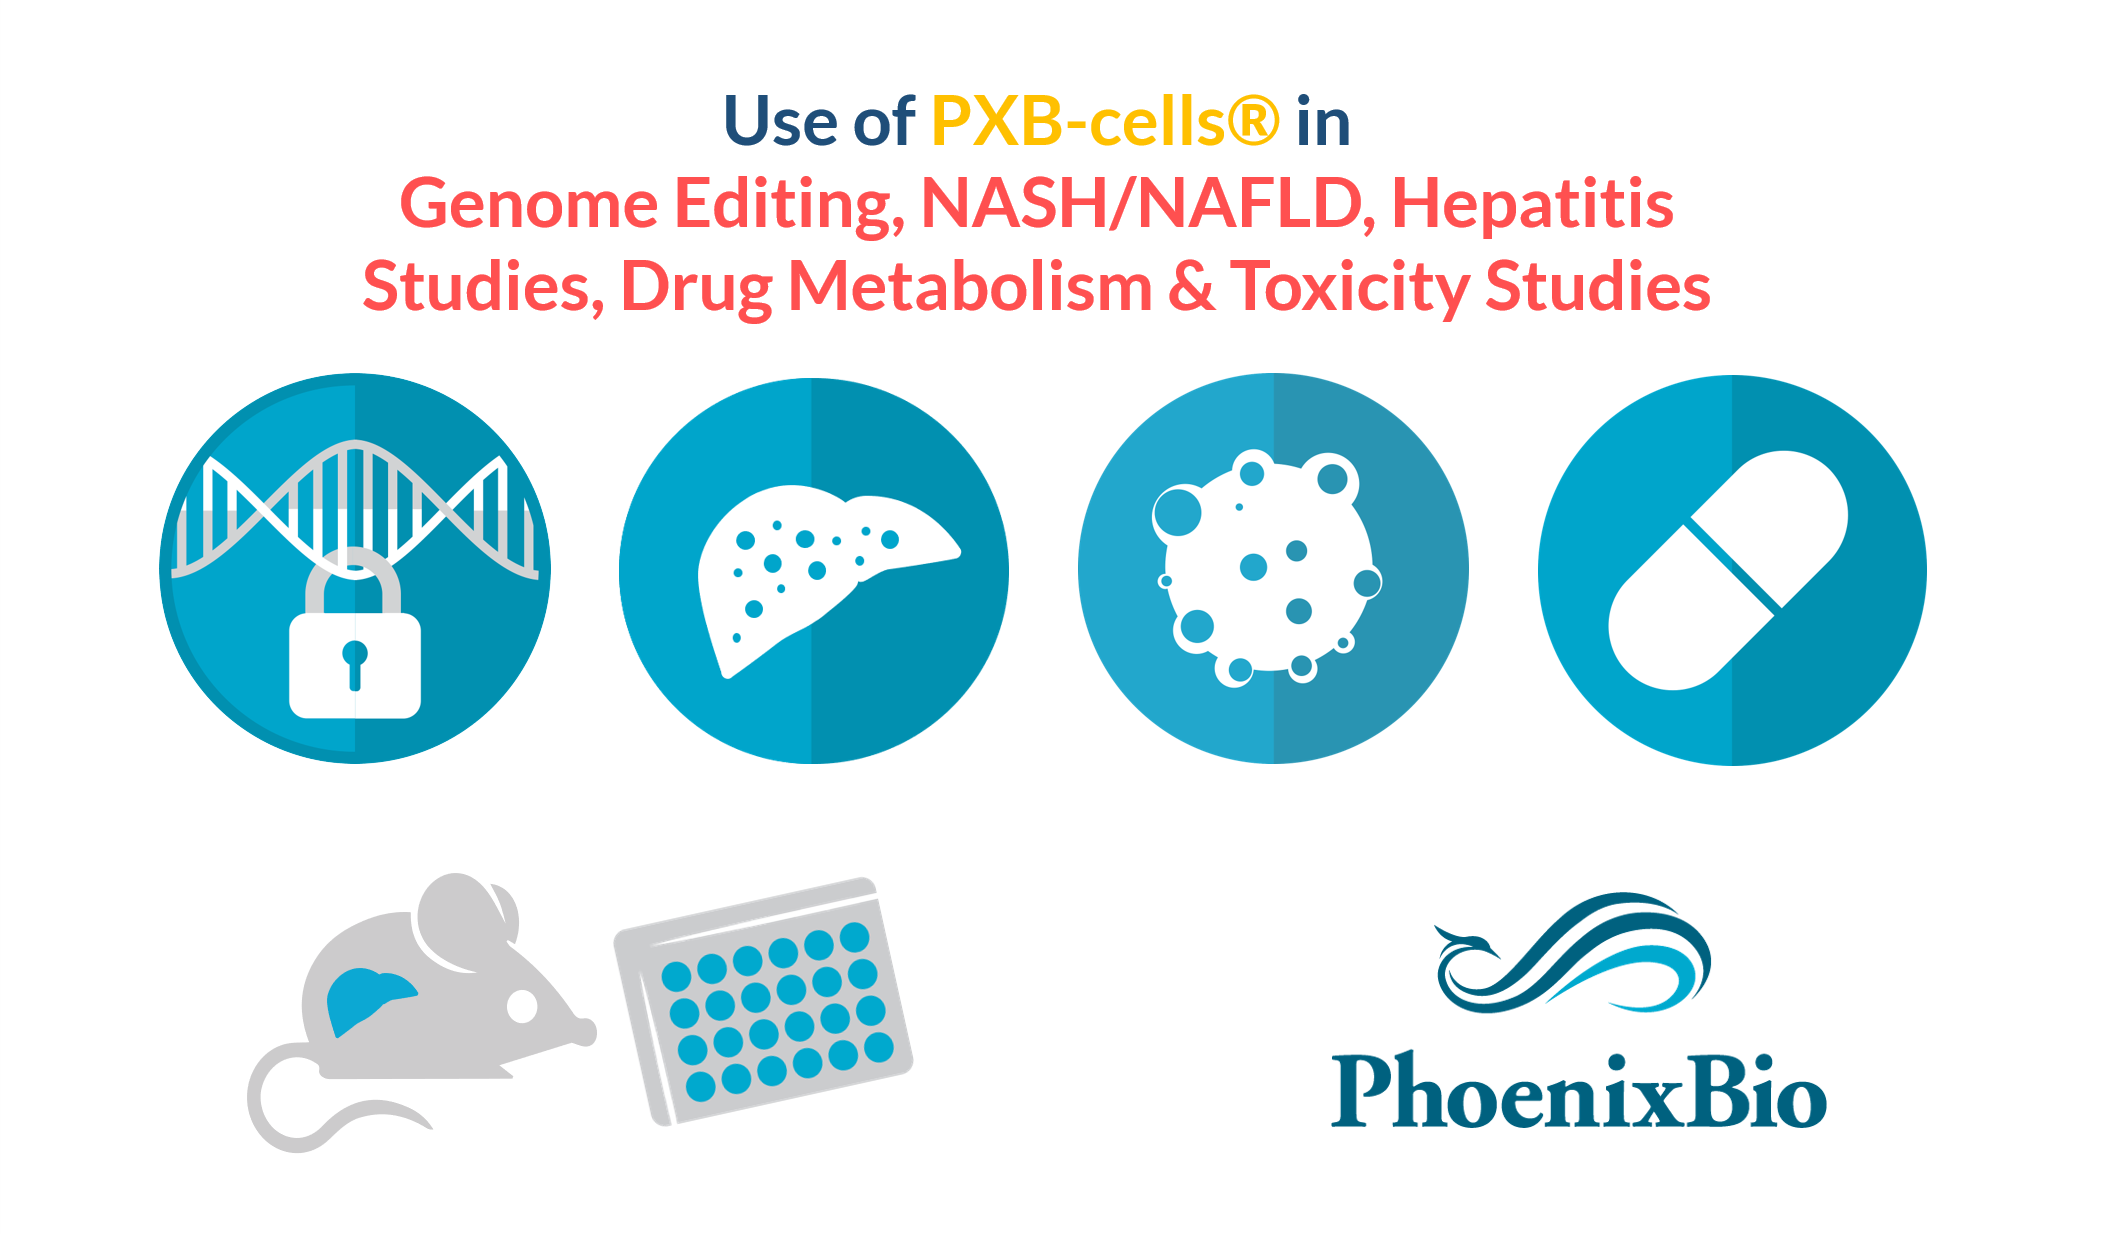 Use of PXB-cells in DMPK-Toxicity, Hepatitis Studies, NASH-NAFLD, Gene Editing